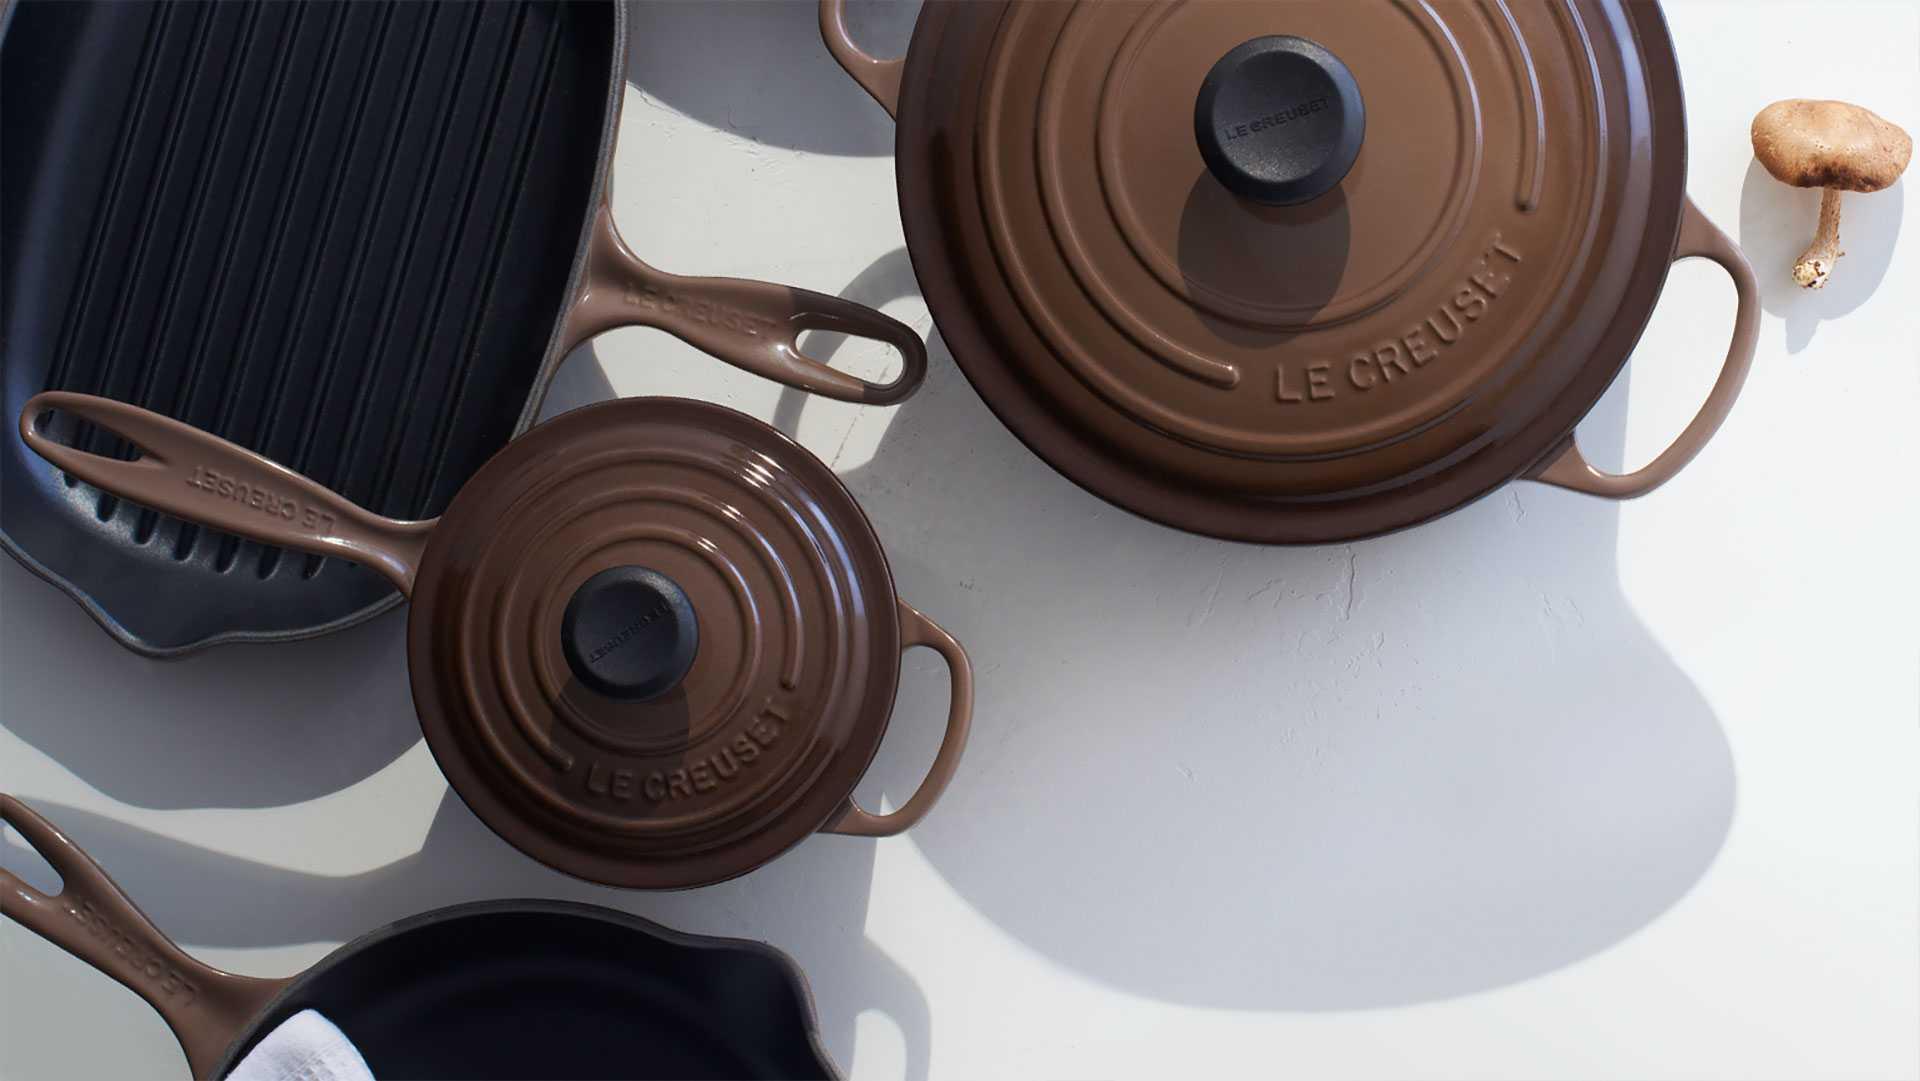 Sale Furniture Rugs Dinnerware Amp More Crate And Barrel